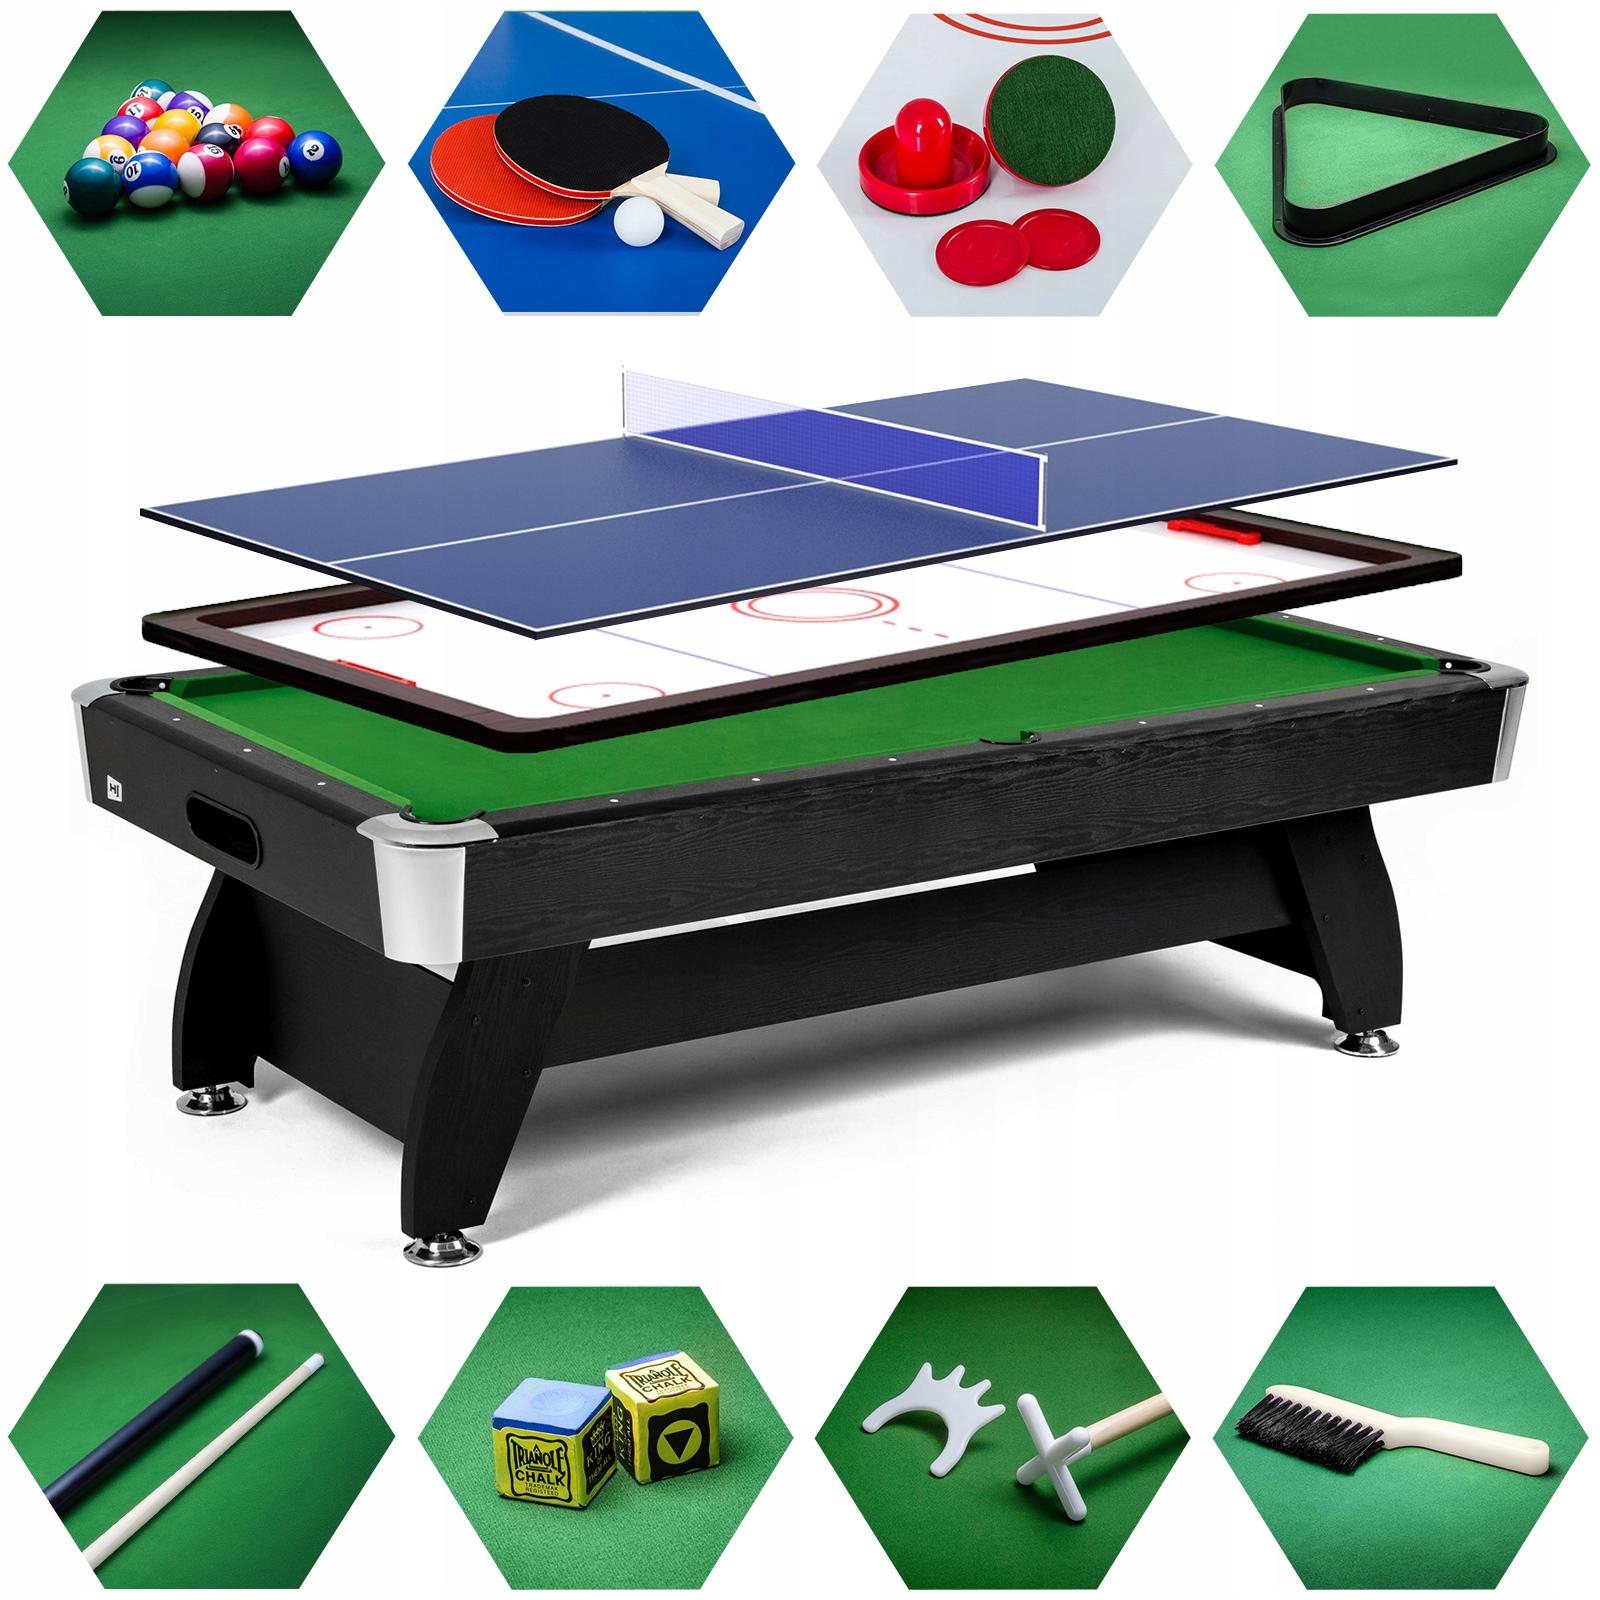 Stół bilardowy 9 ft с nakładką cymbergaj ping pong